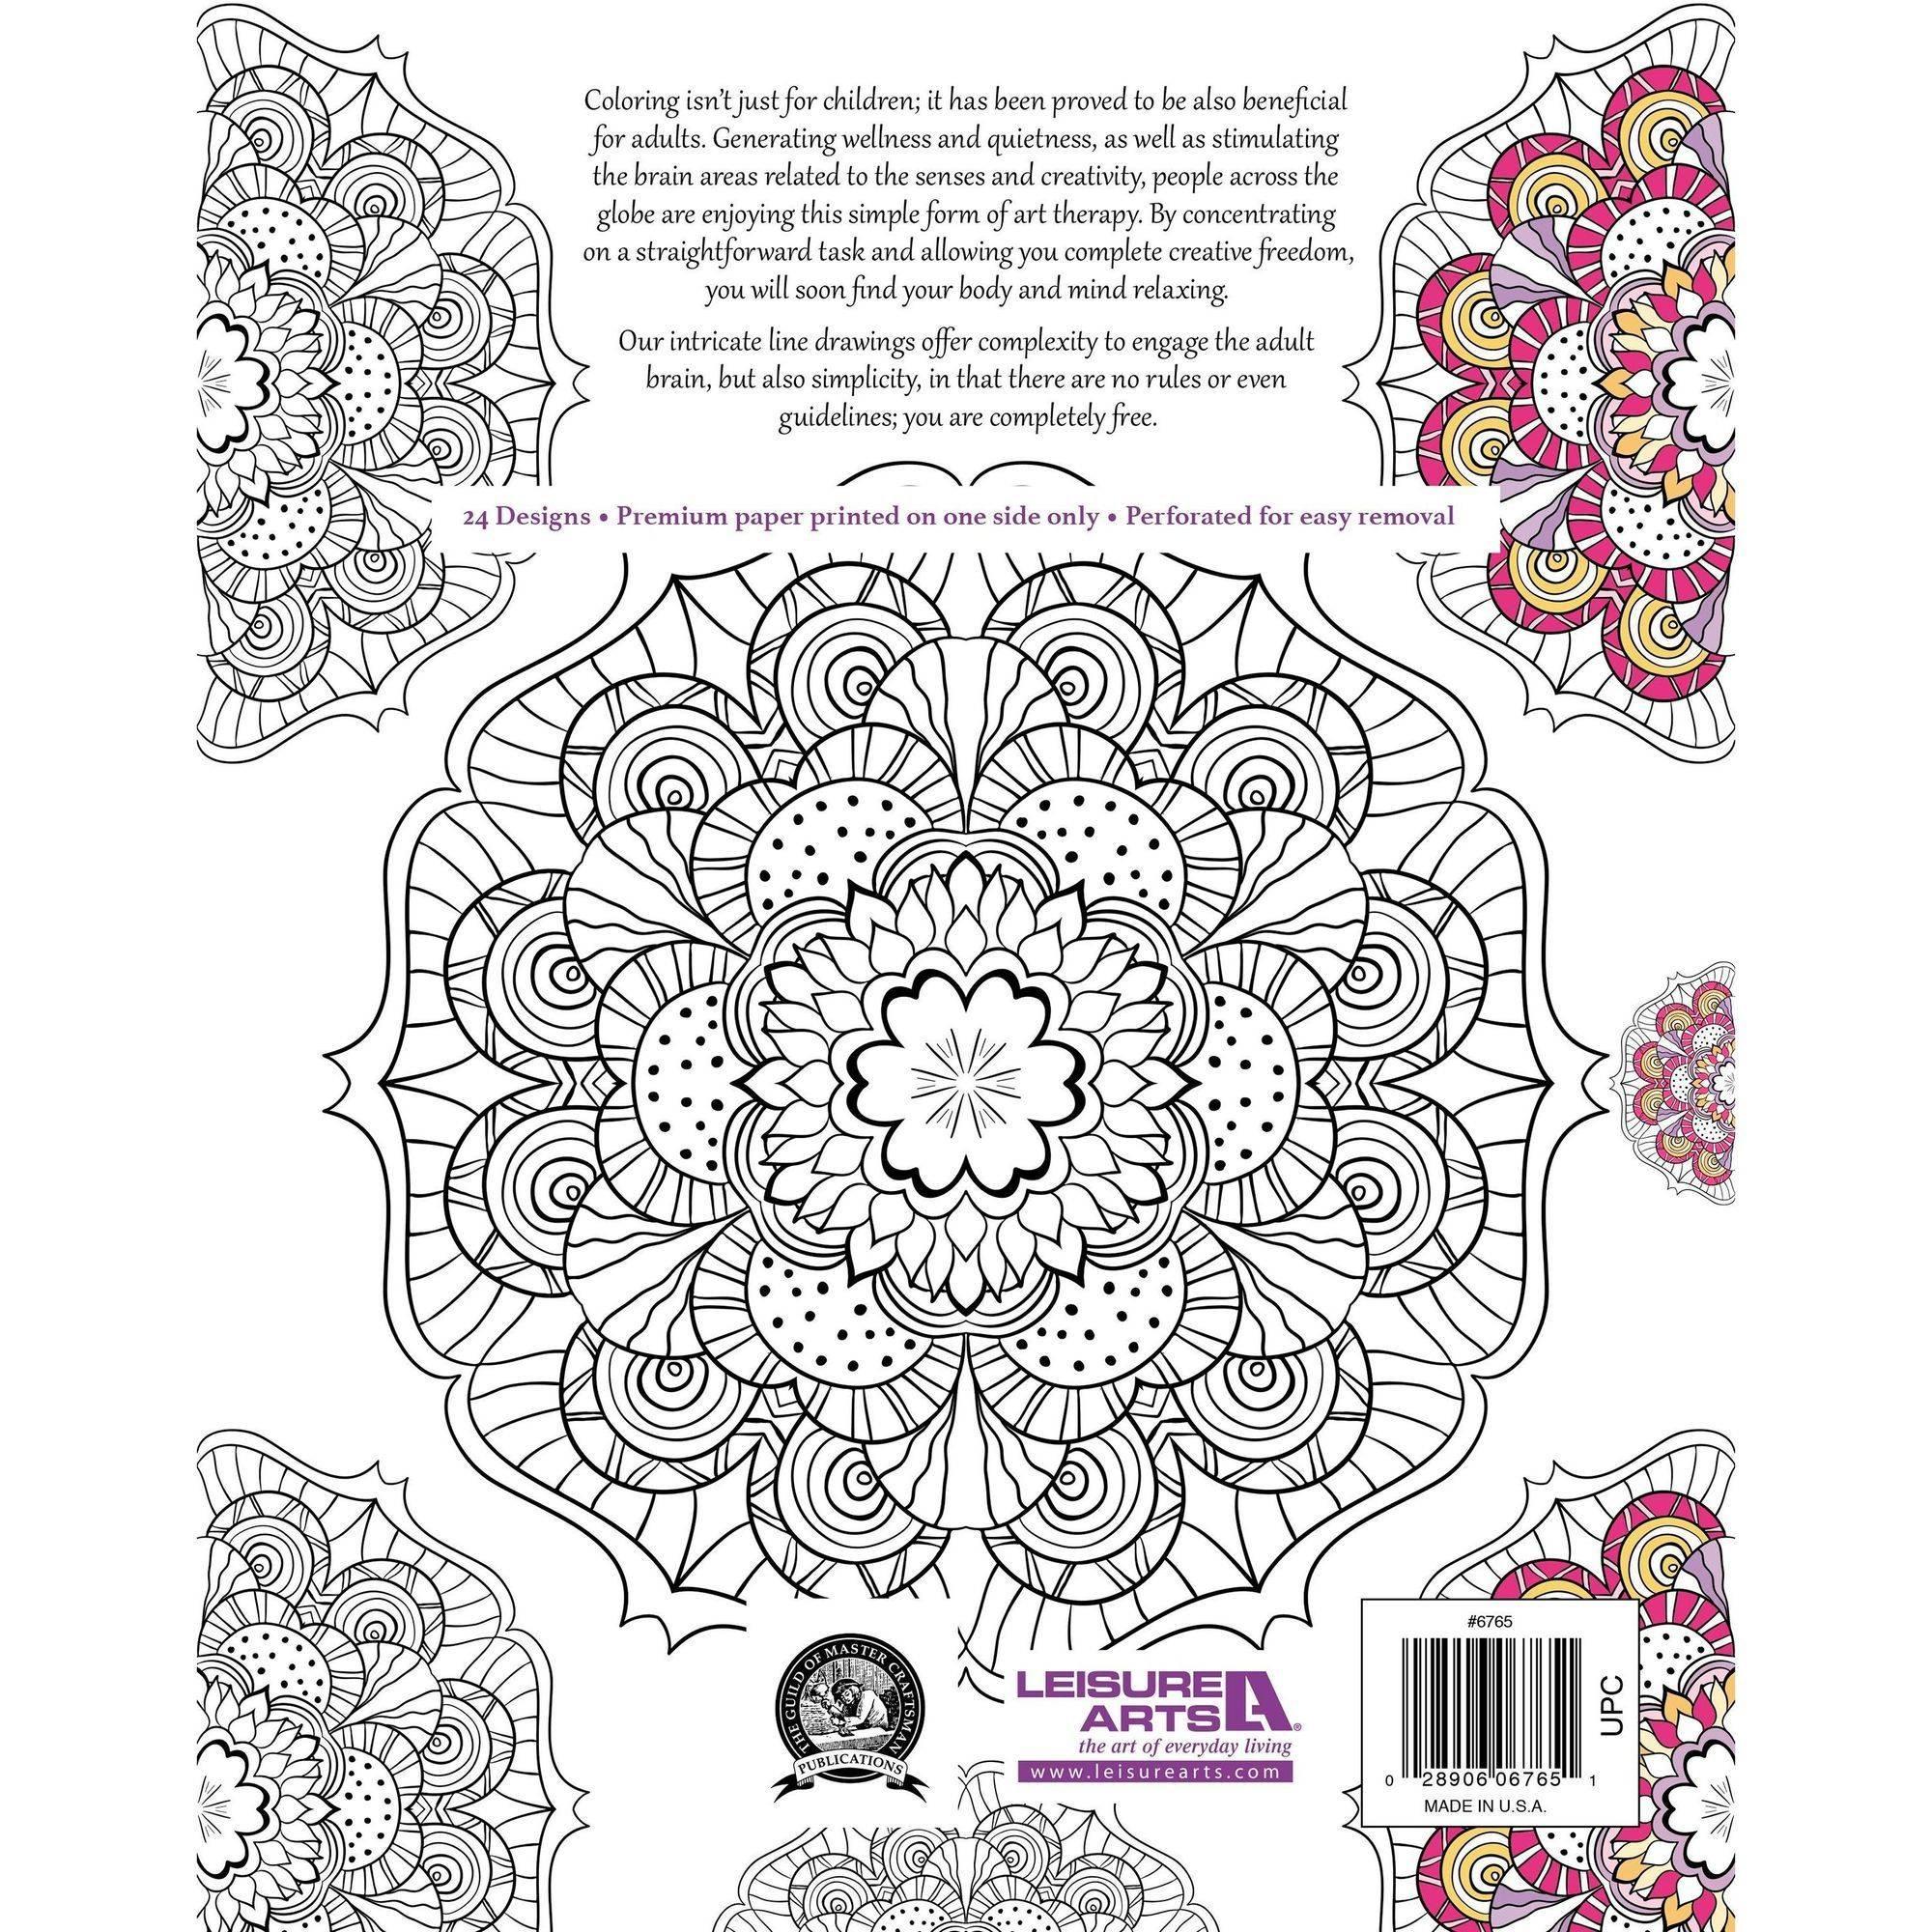 Color art mandala wonders - Color Art Mandala Wonders 18